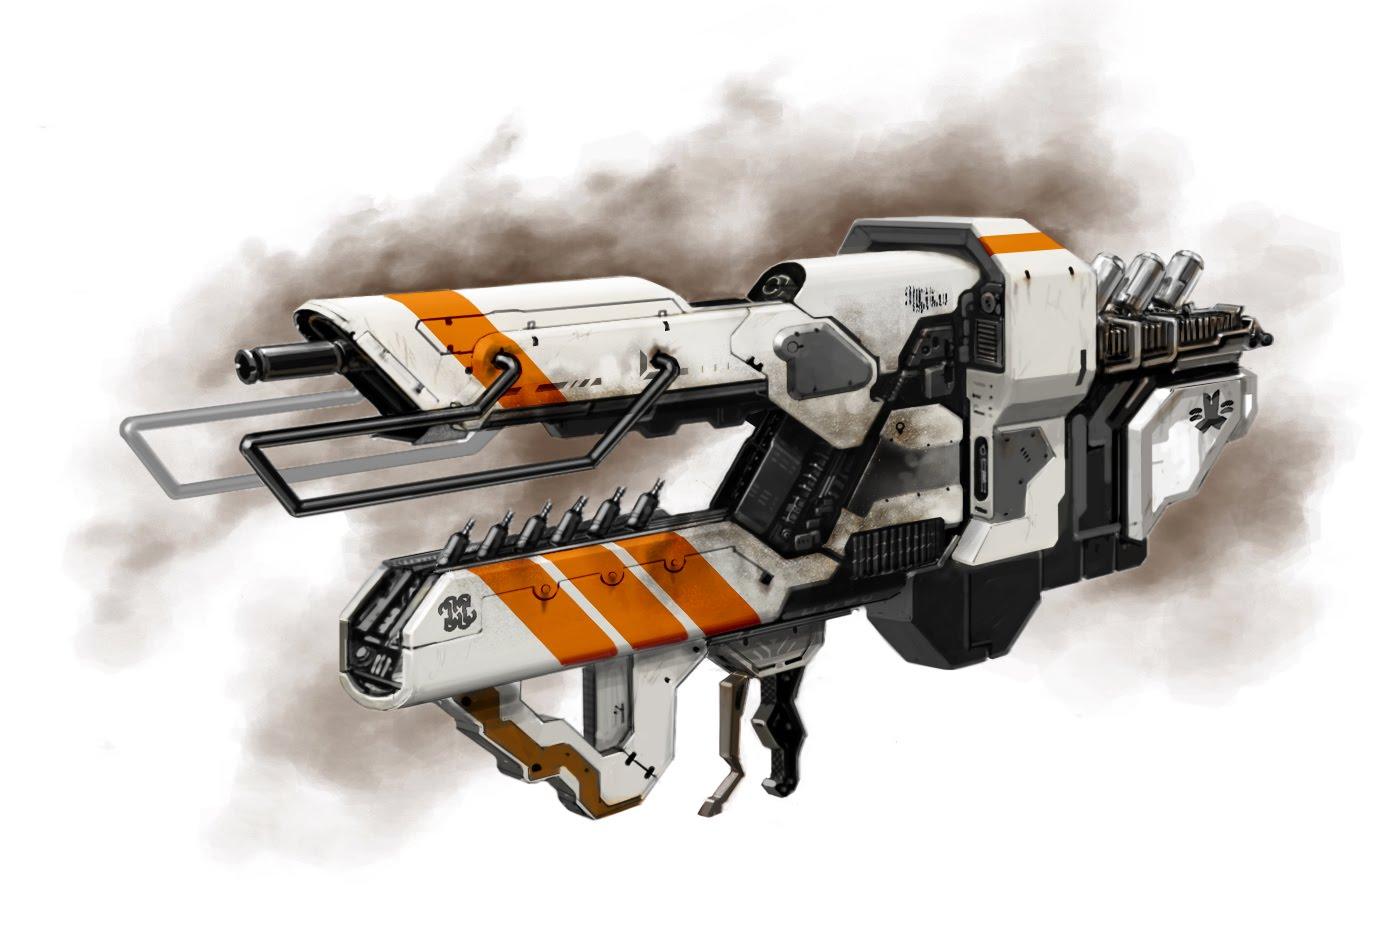 John C. Newton: District 9 Heavy weapon